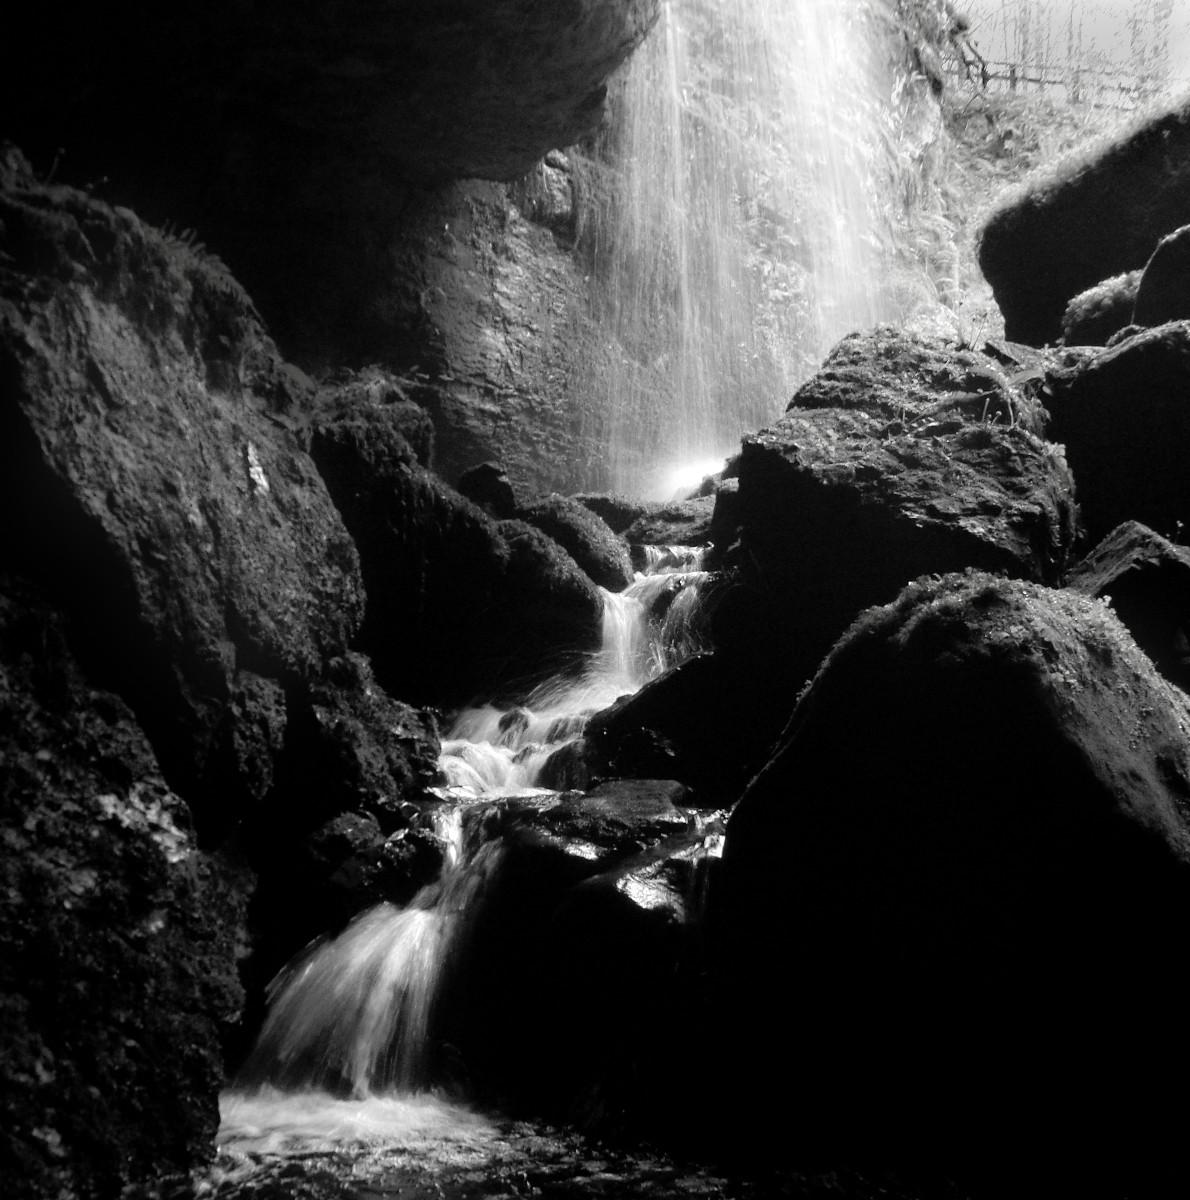 MONO - Boho Waterfall by James Trotman (6 marks)